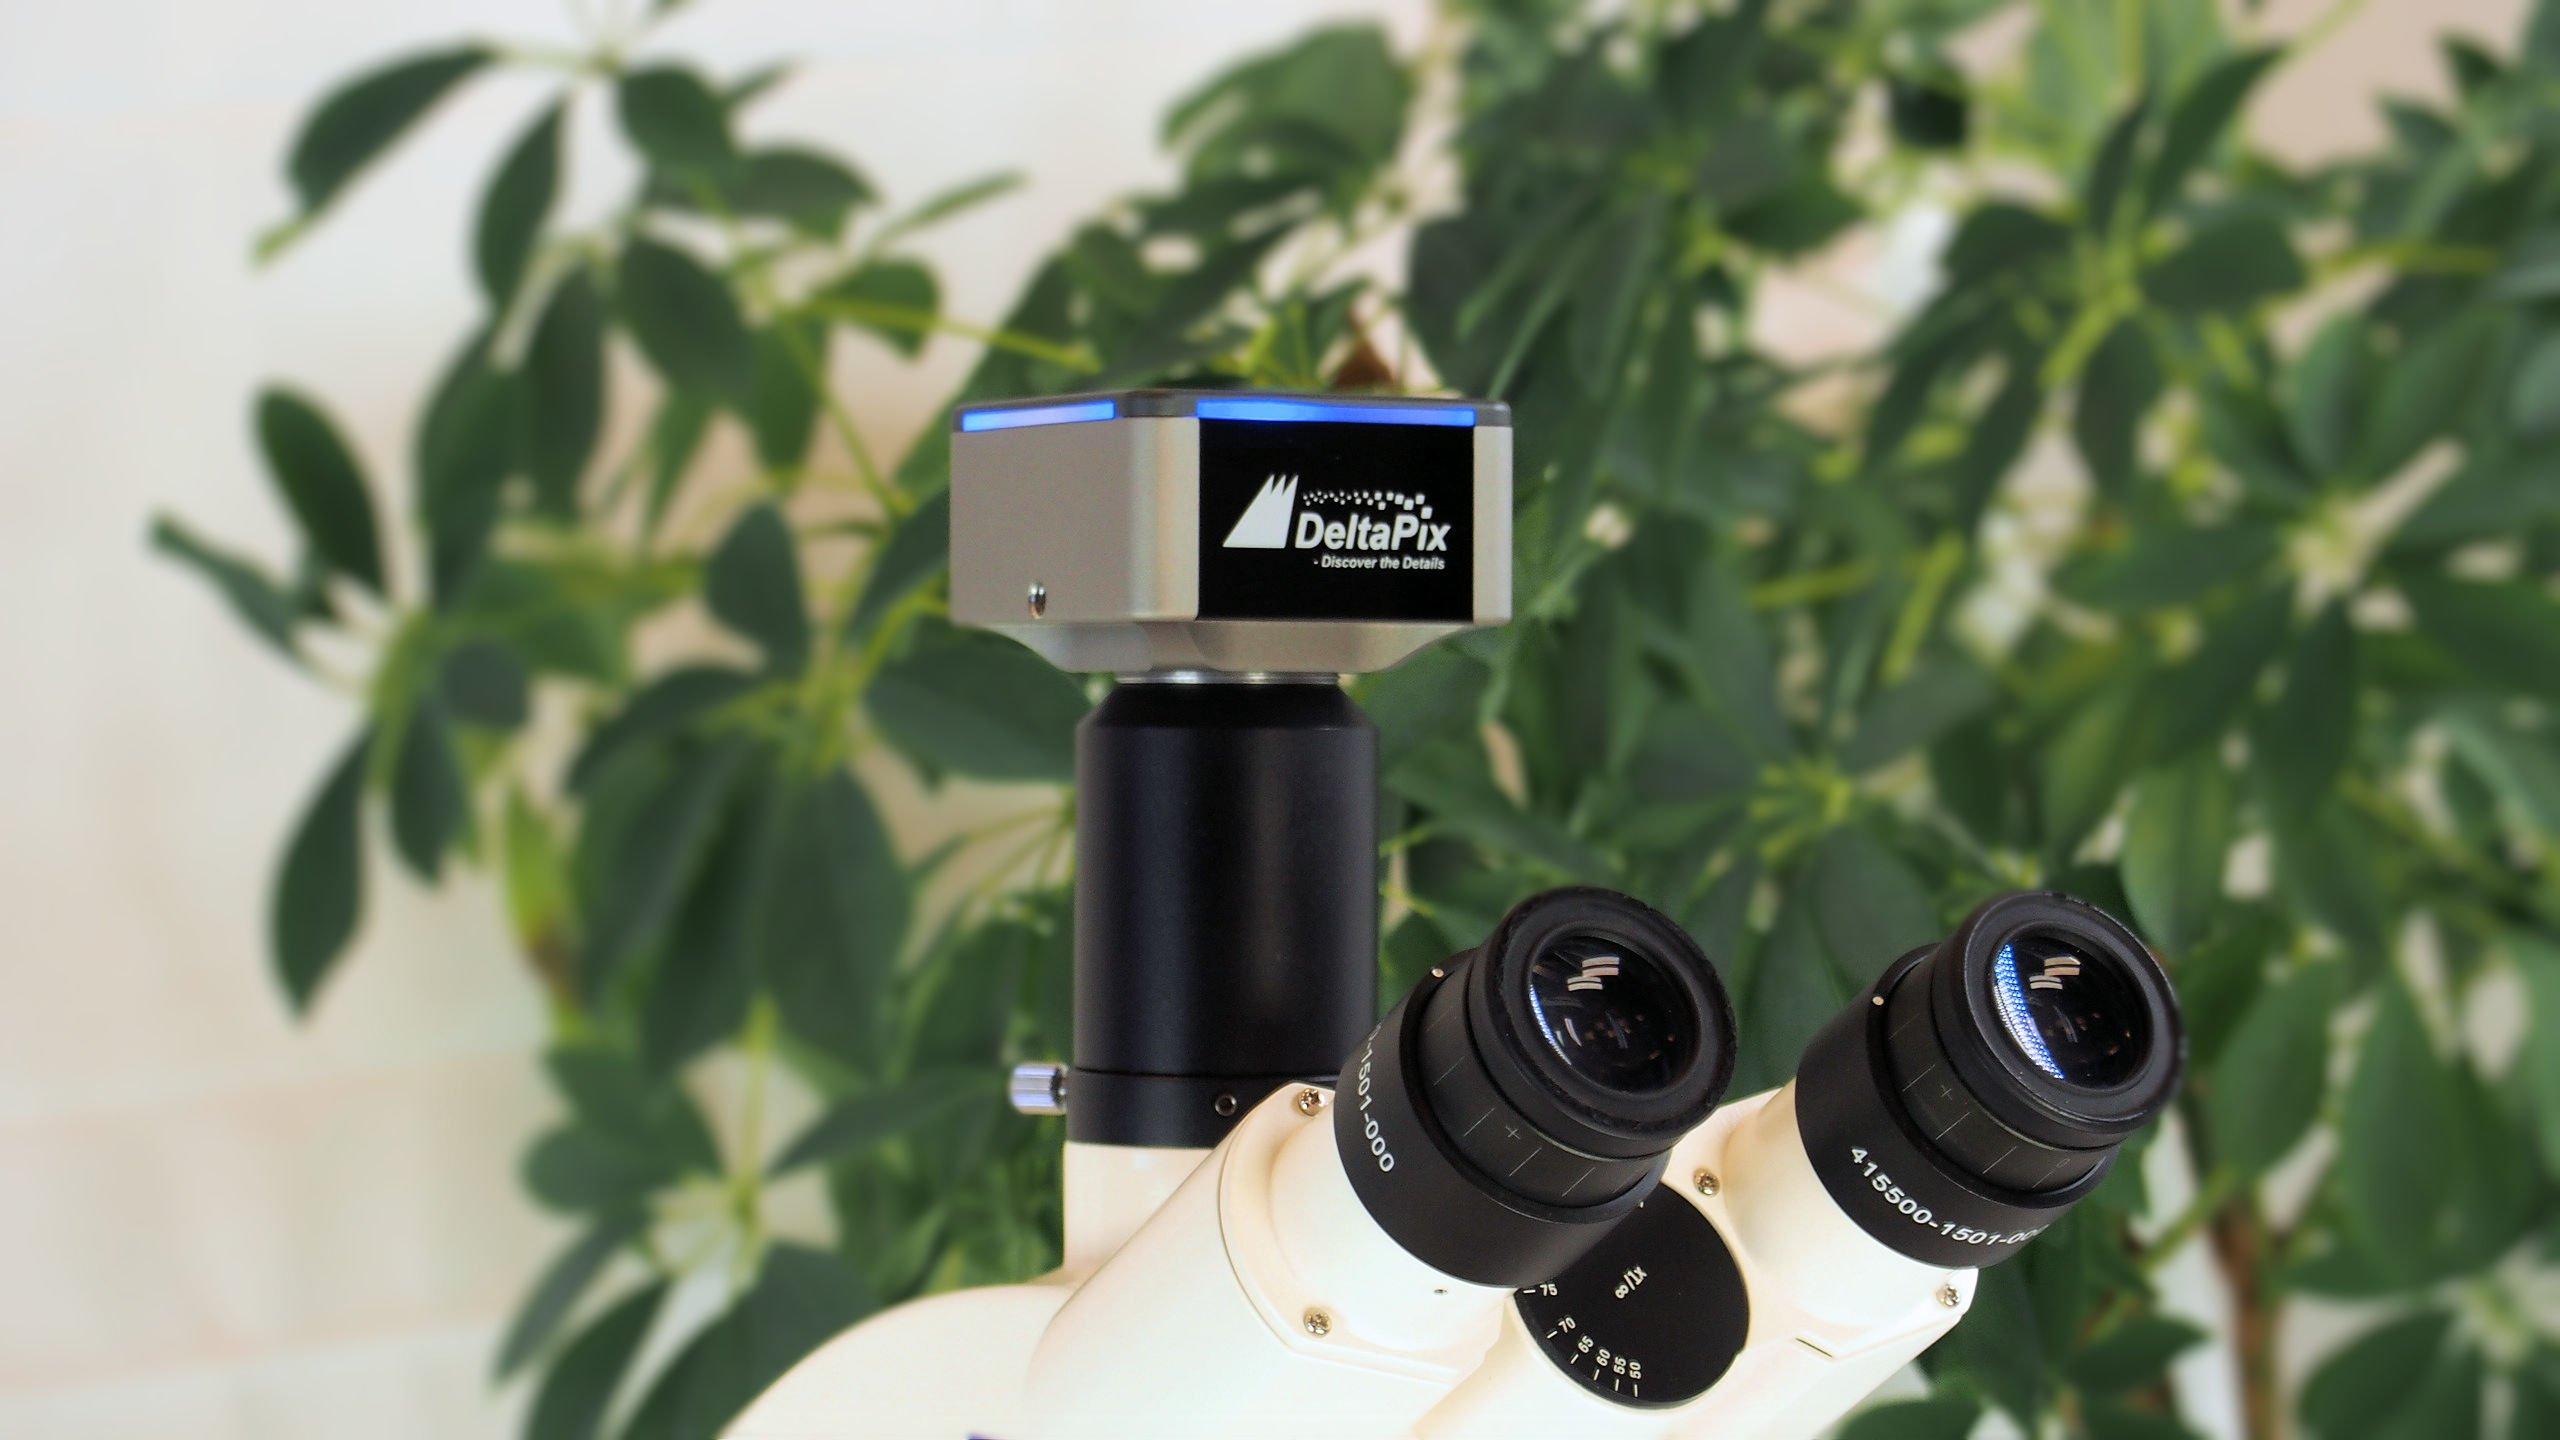 DeltaPix microscope camera on Olympus microscope